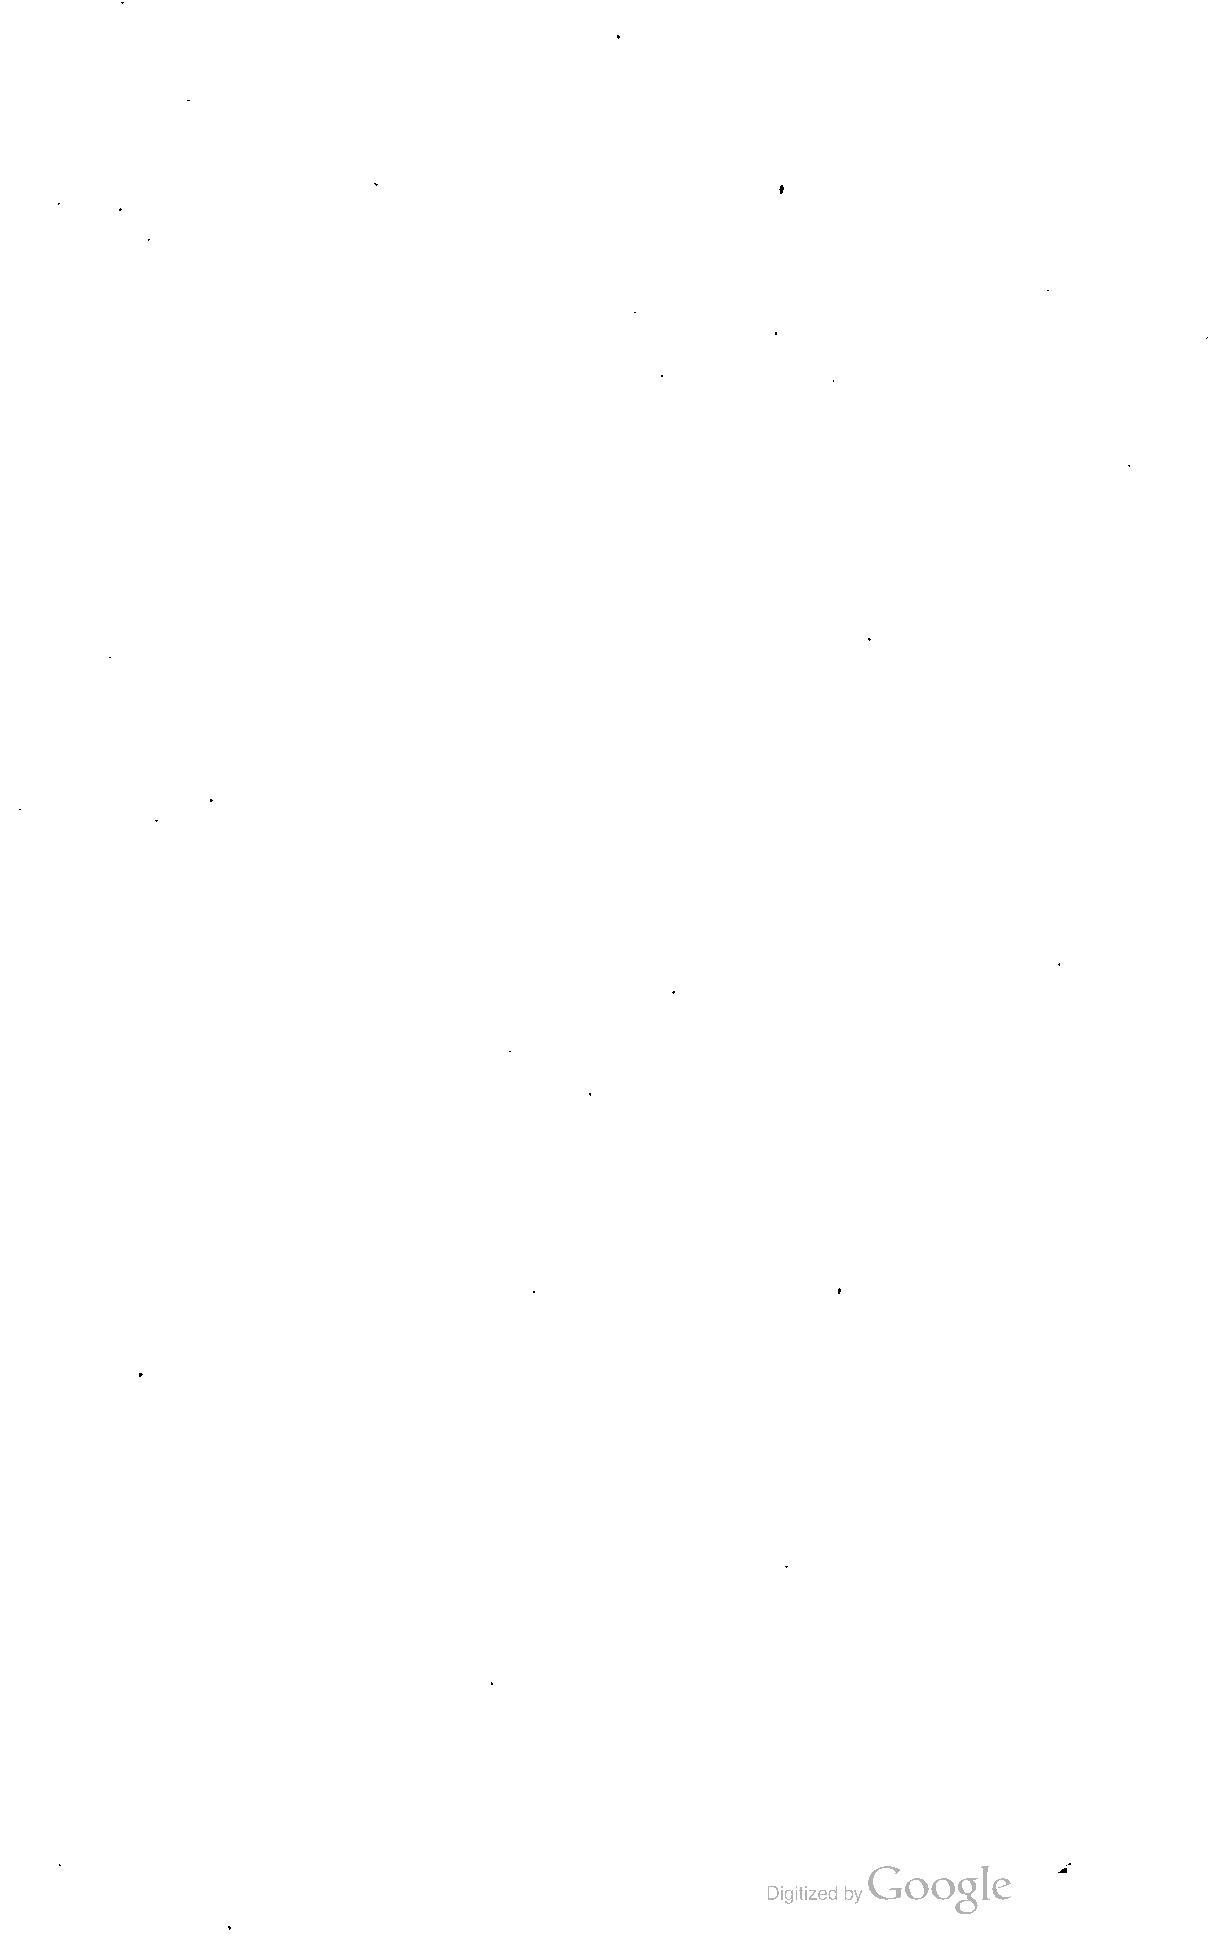 page sand - consuelo - 1856 - tome 3 djvu  423